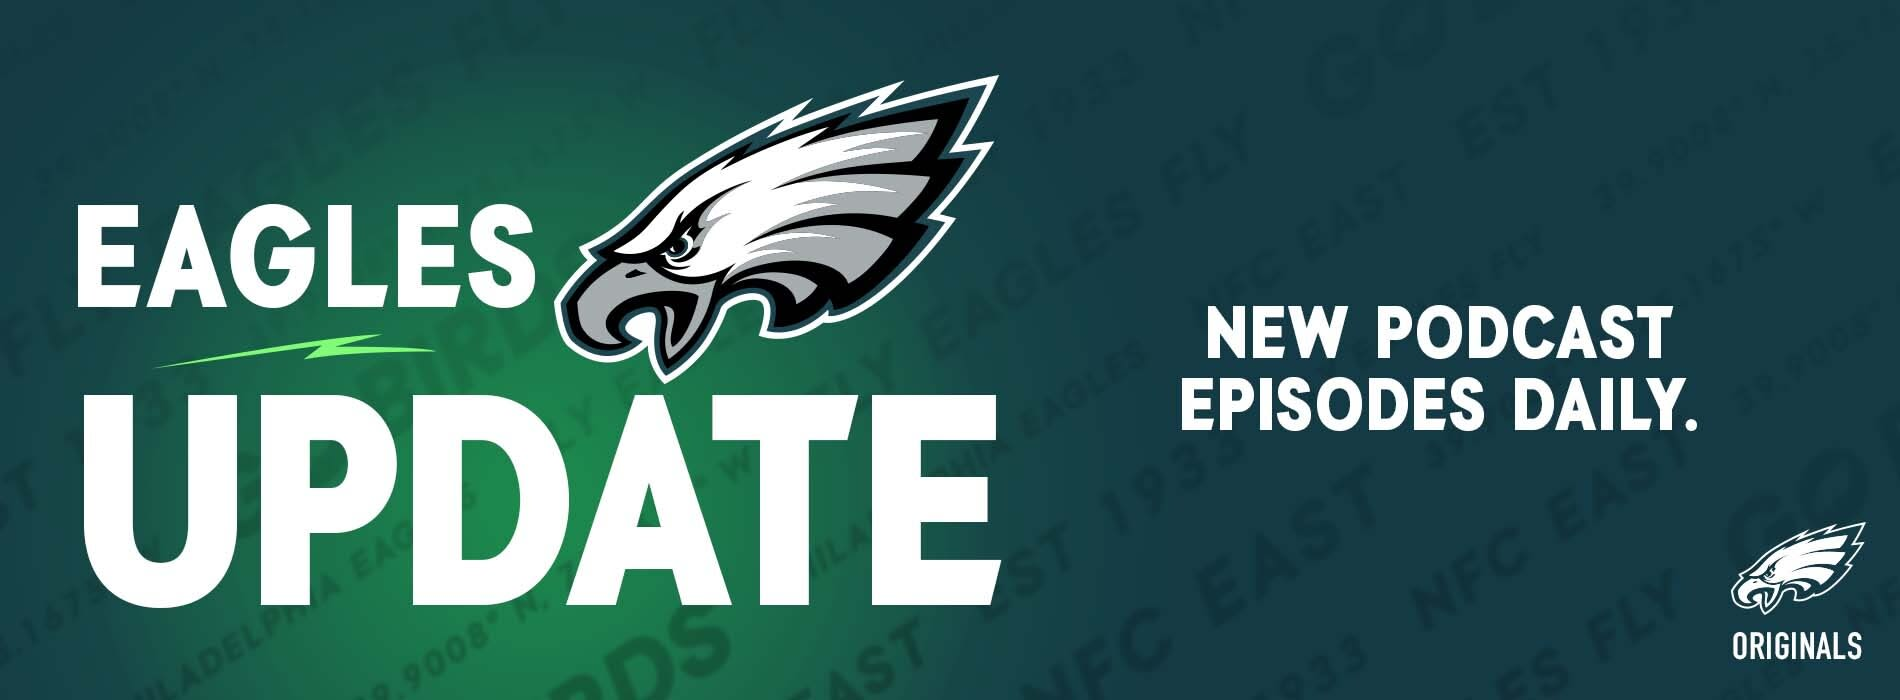 Eagles-Update-1900x700 (1)